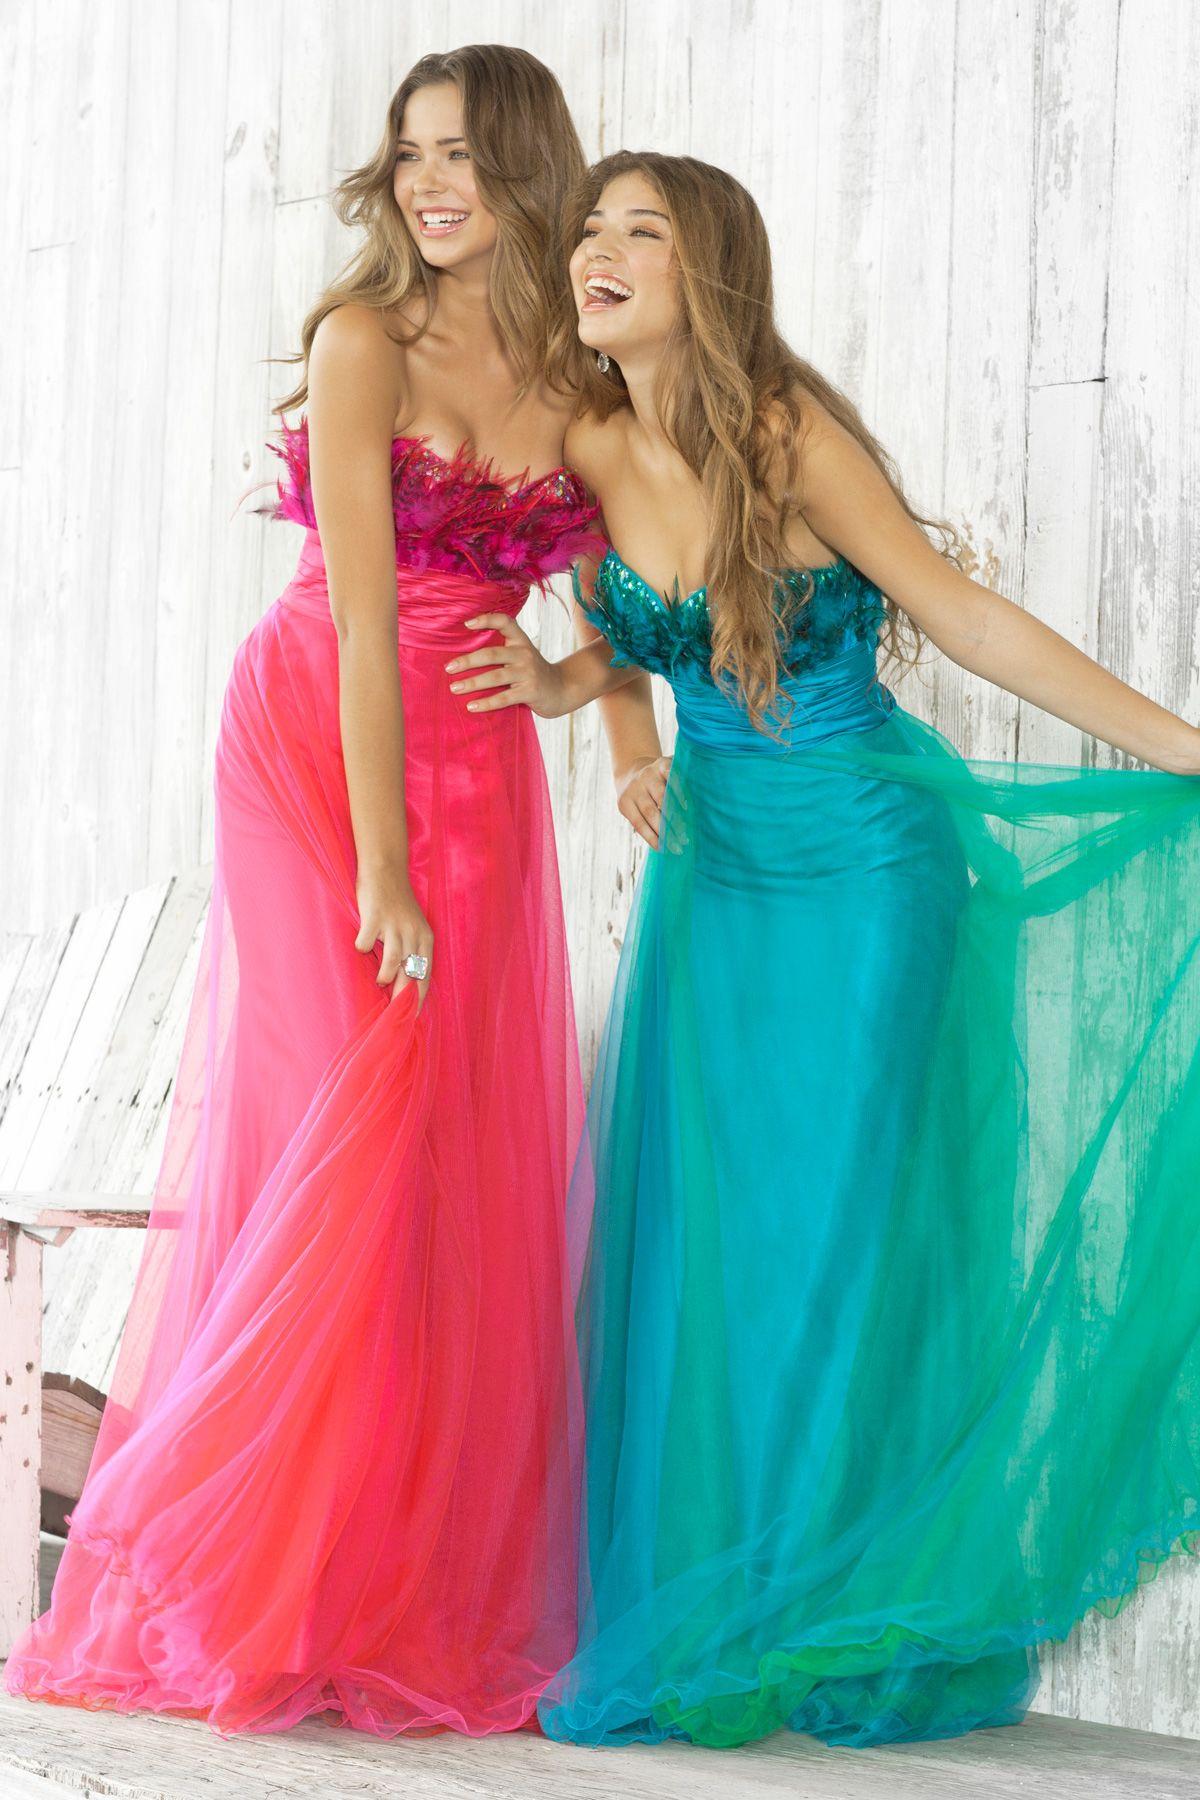 Bridesmaid dreses wedding ideas pinterest full skirts bald